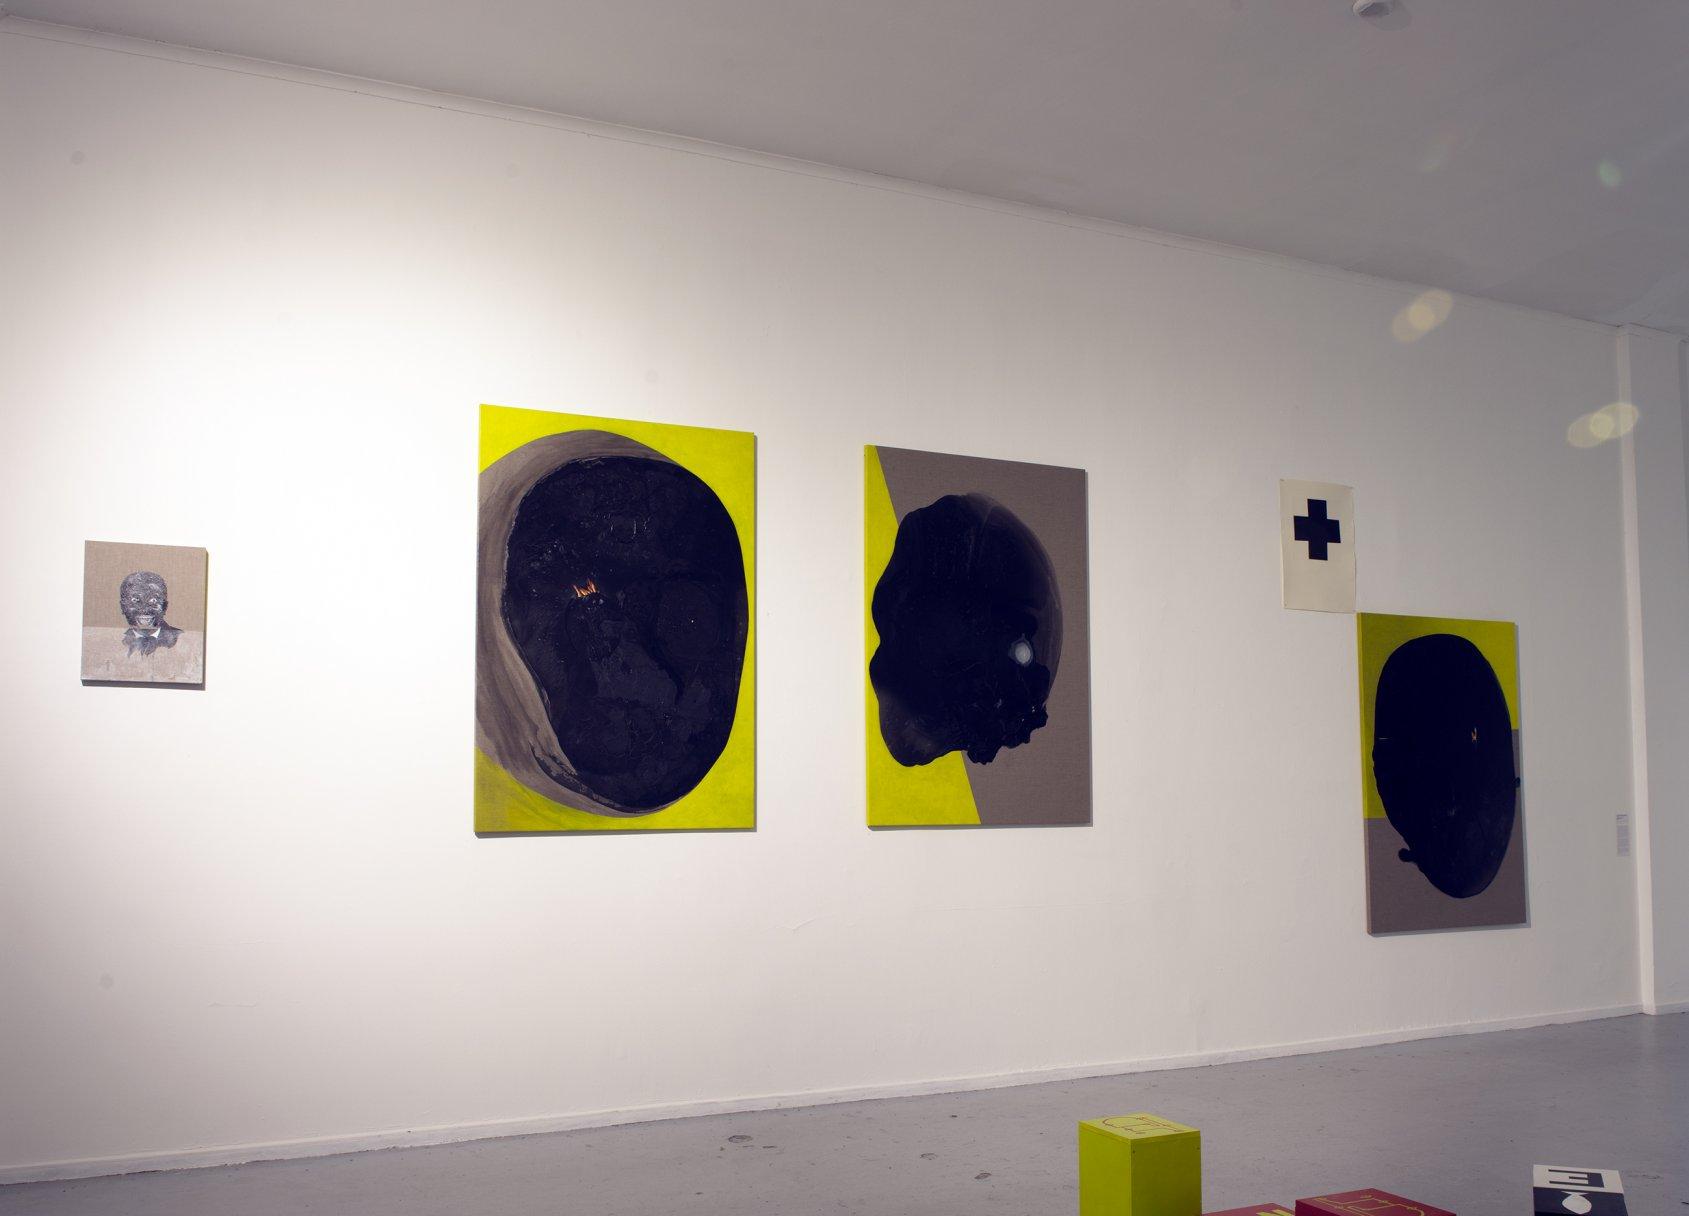 Proyecto CL Border Control (The Black Face) (2018) - Ricardo Fuentealba-Fabio